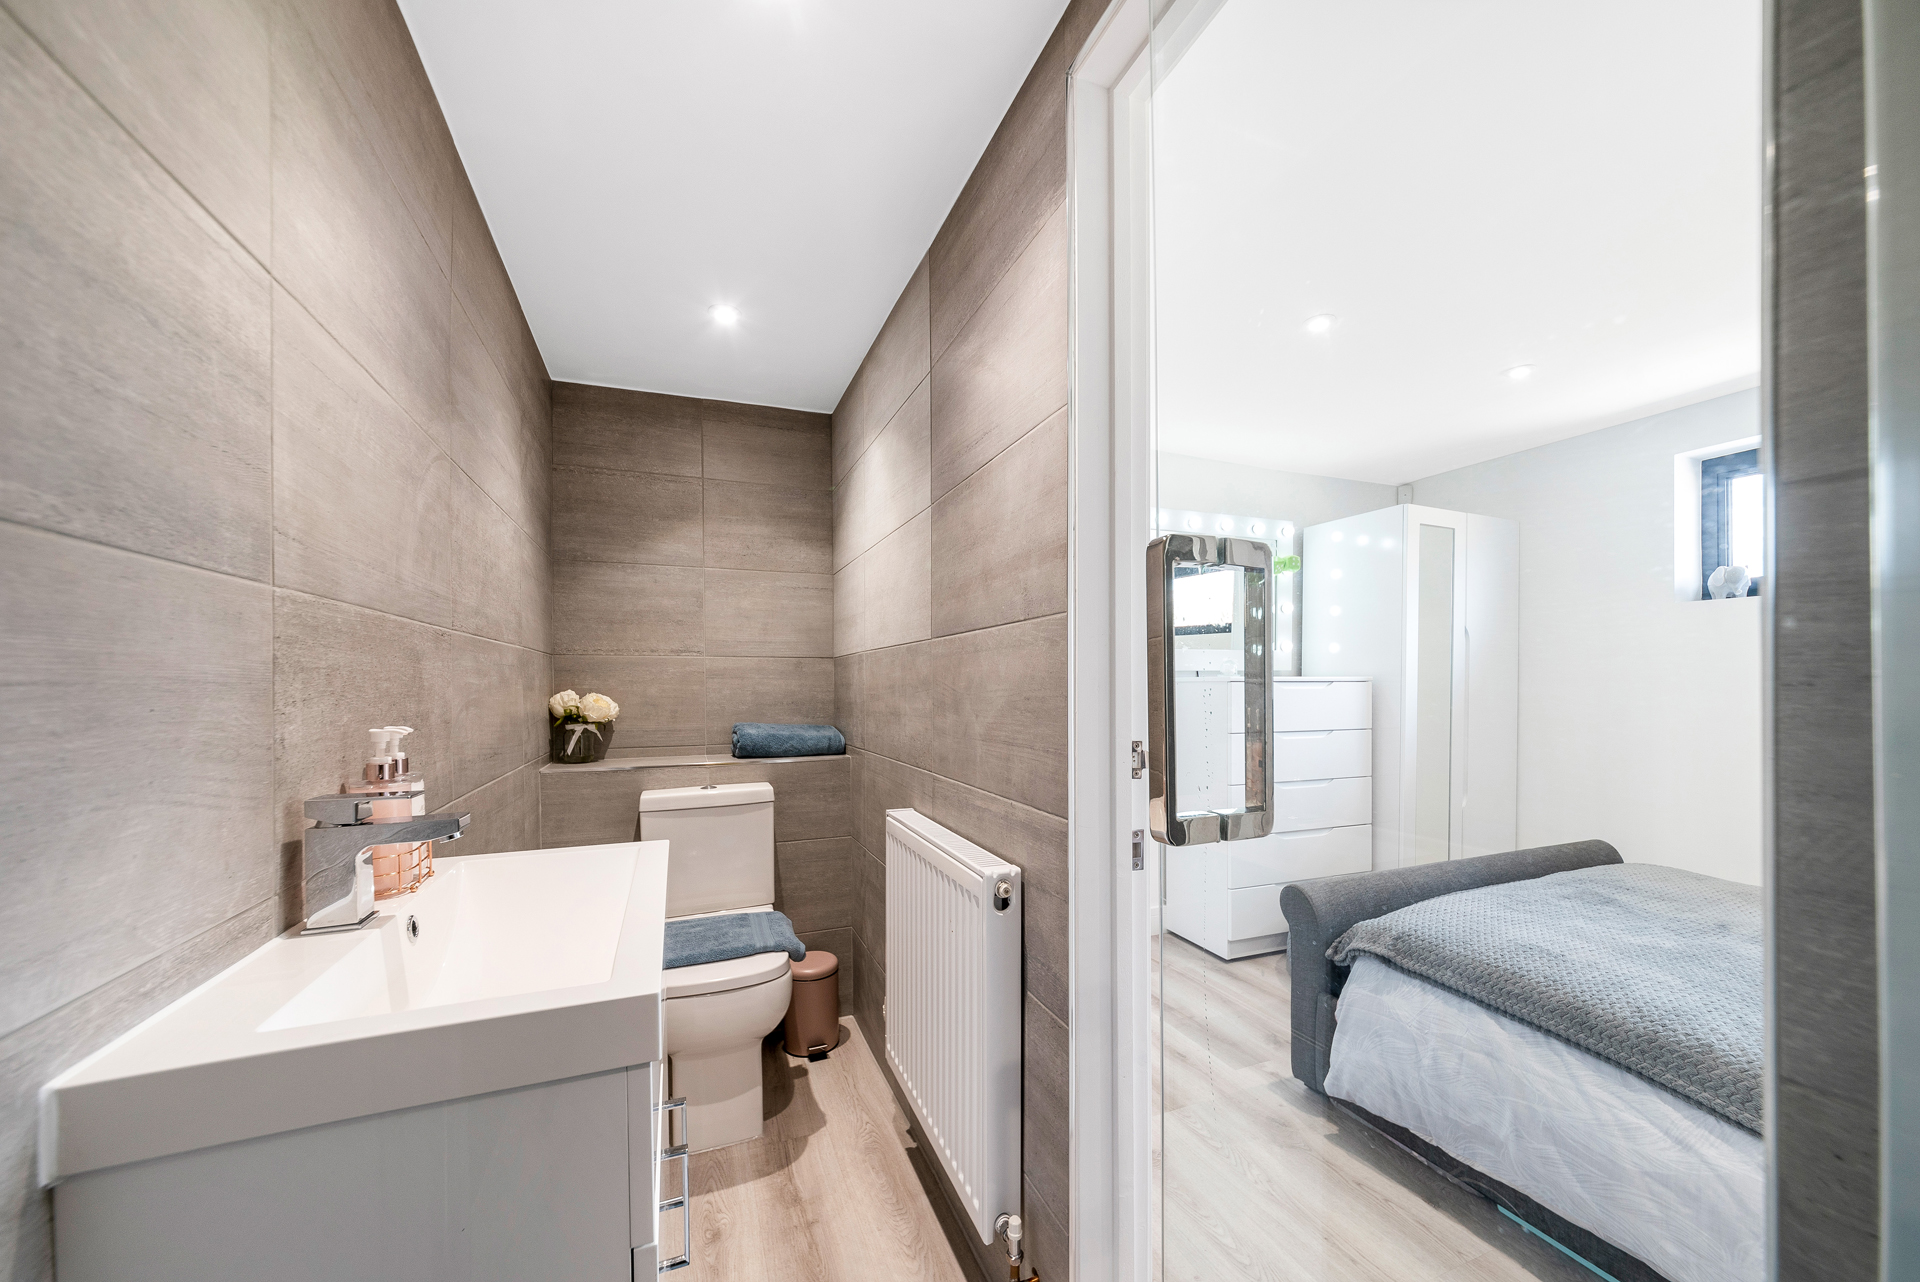 Garden room with bedroom and ensuite, Essex